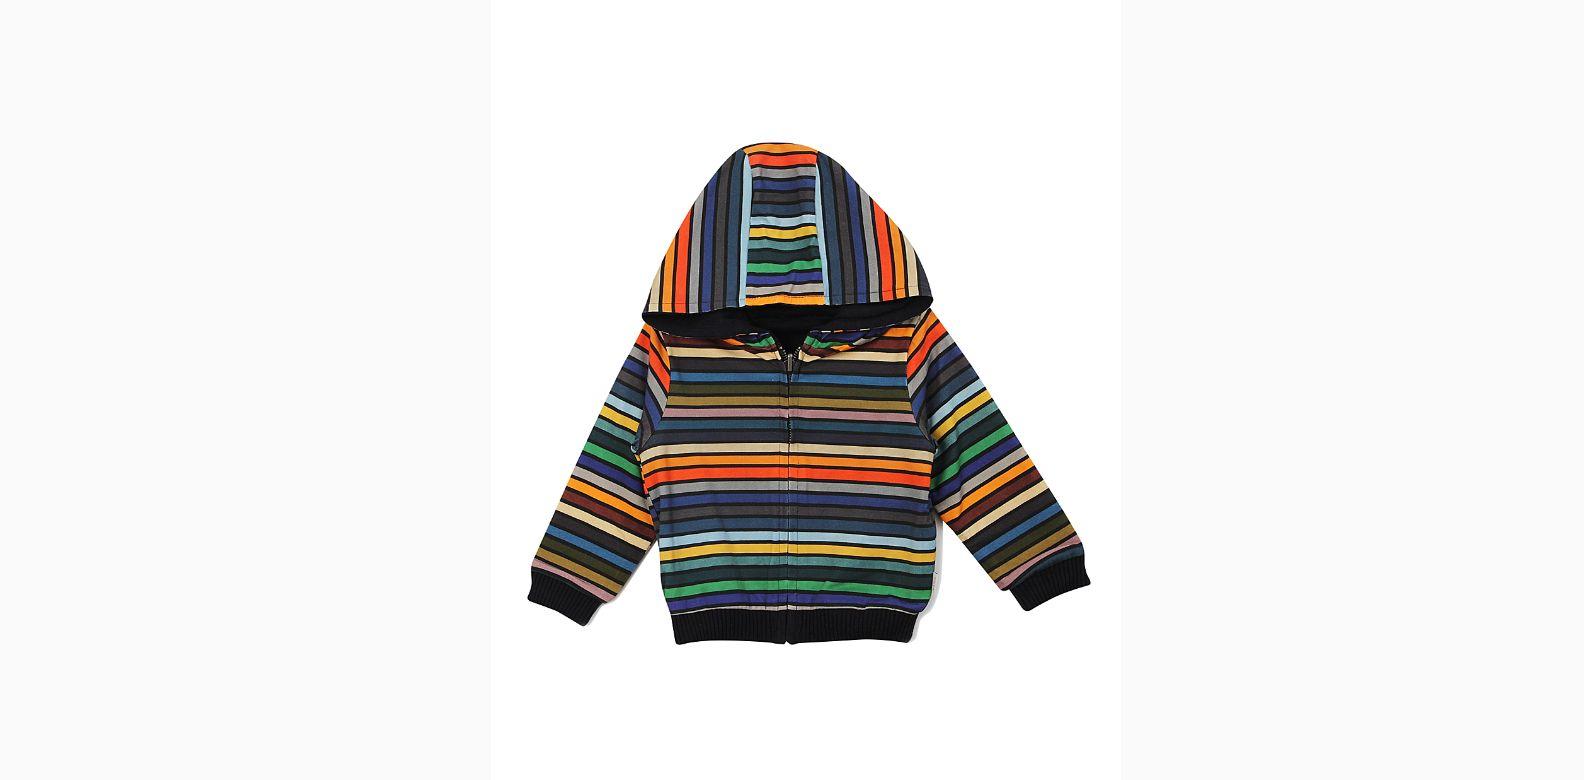 Paul Smith Junior baby jacket; B1-59 The Shoppes at Marina Bay Sands